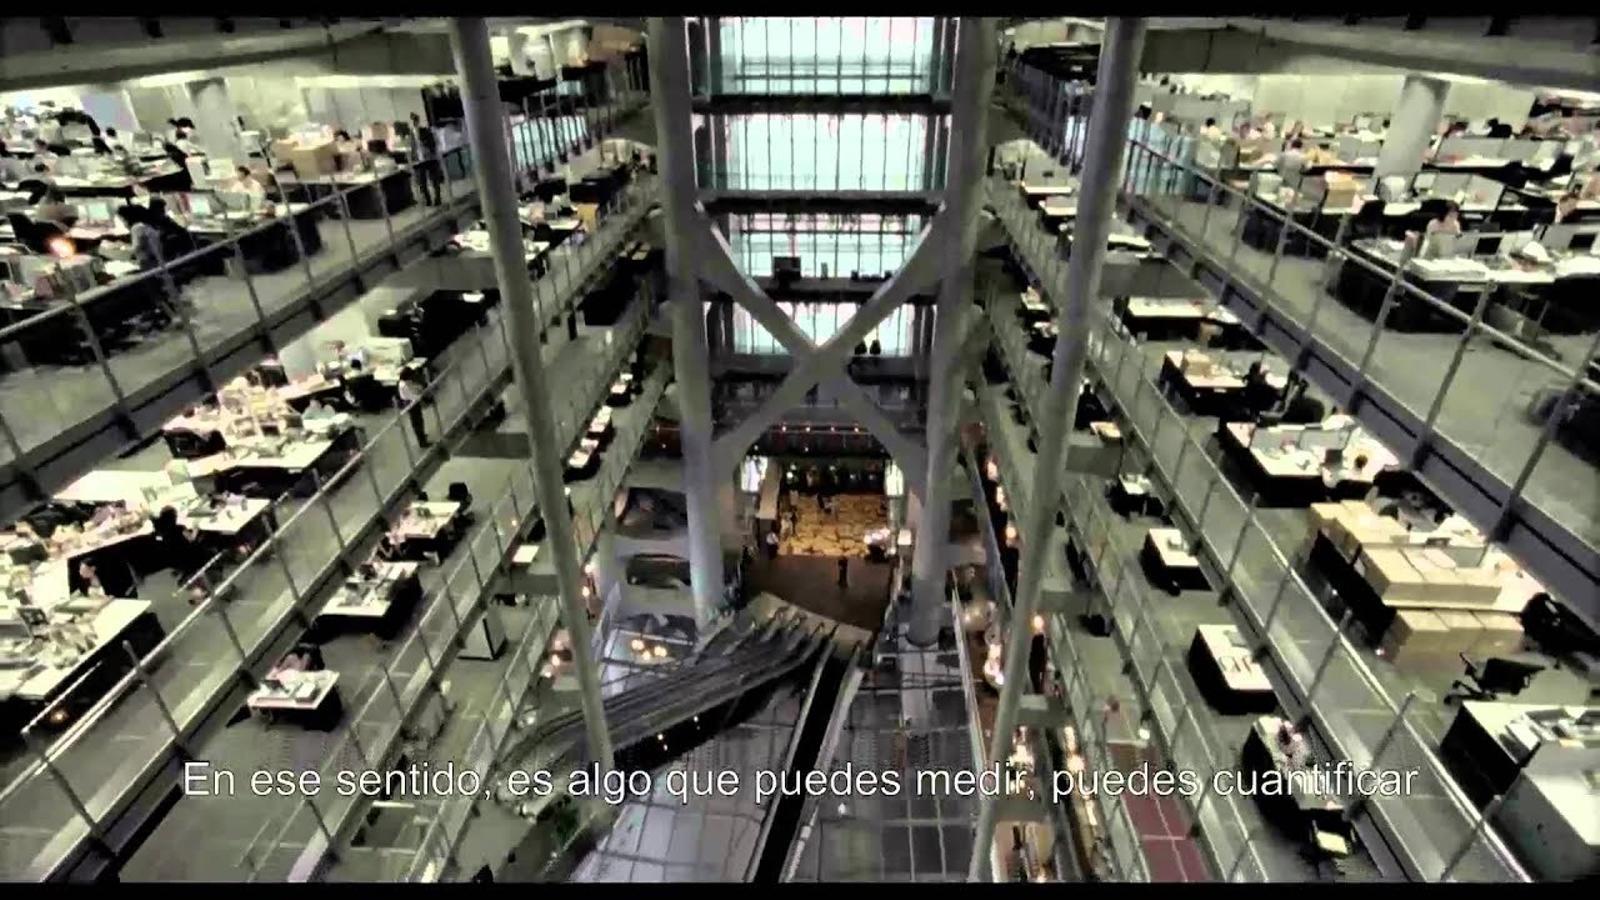 Tràiler del documental '¿Cuanto pesa su edificio, Sr. Foster?'